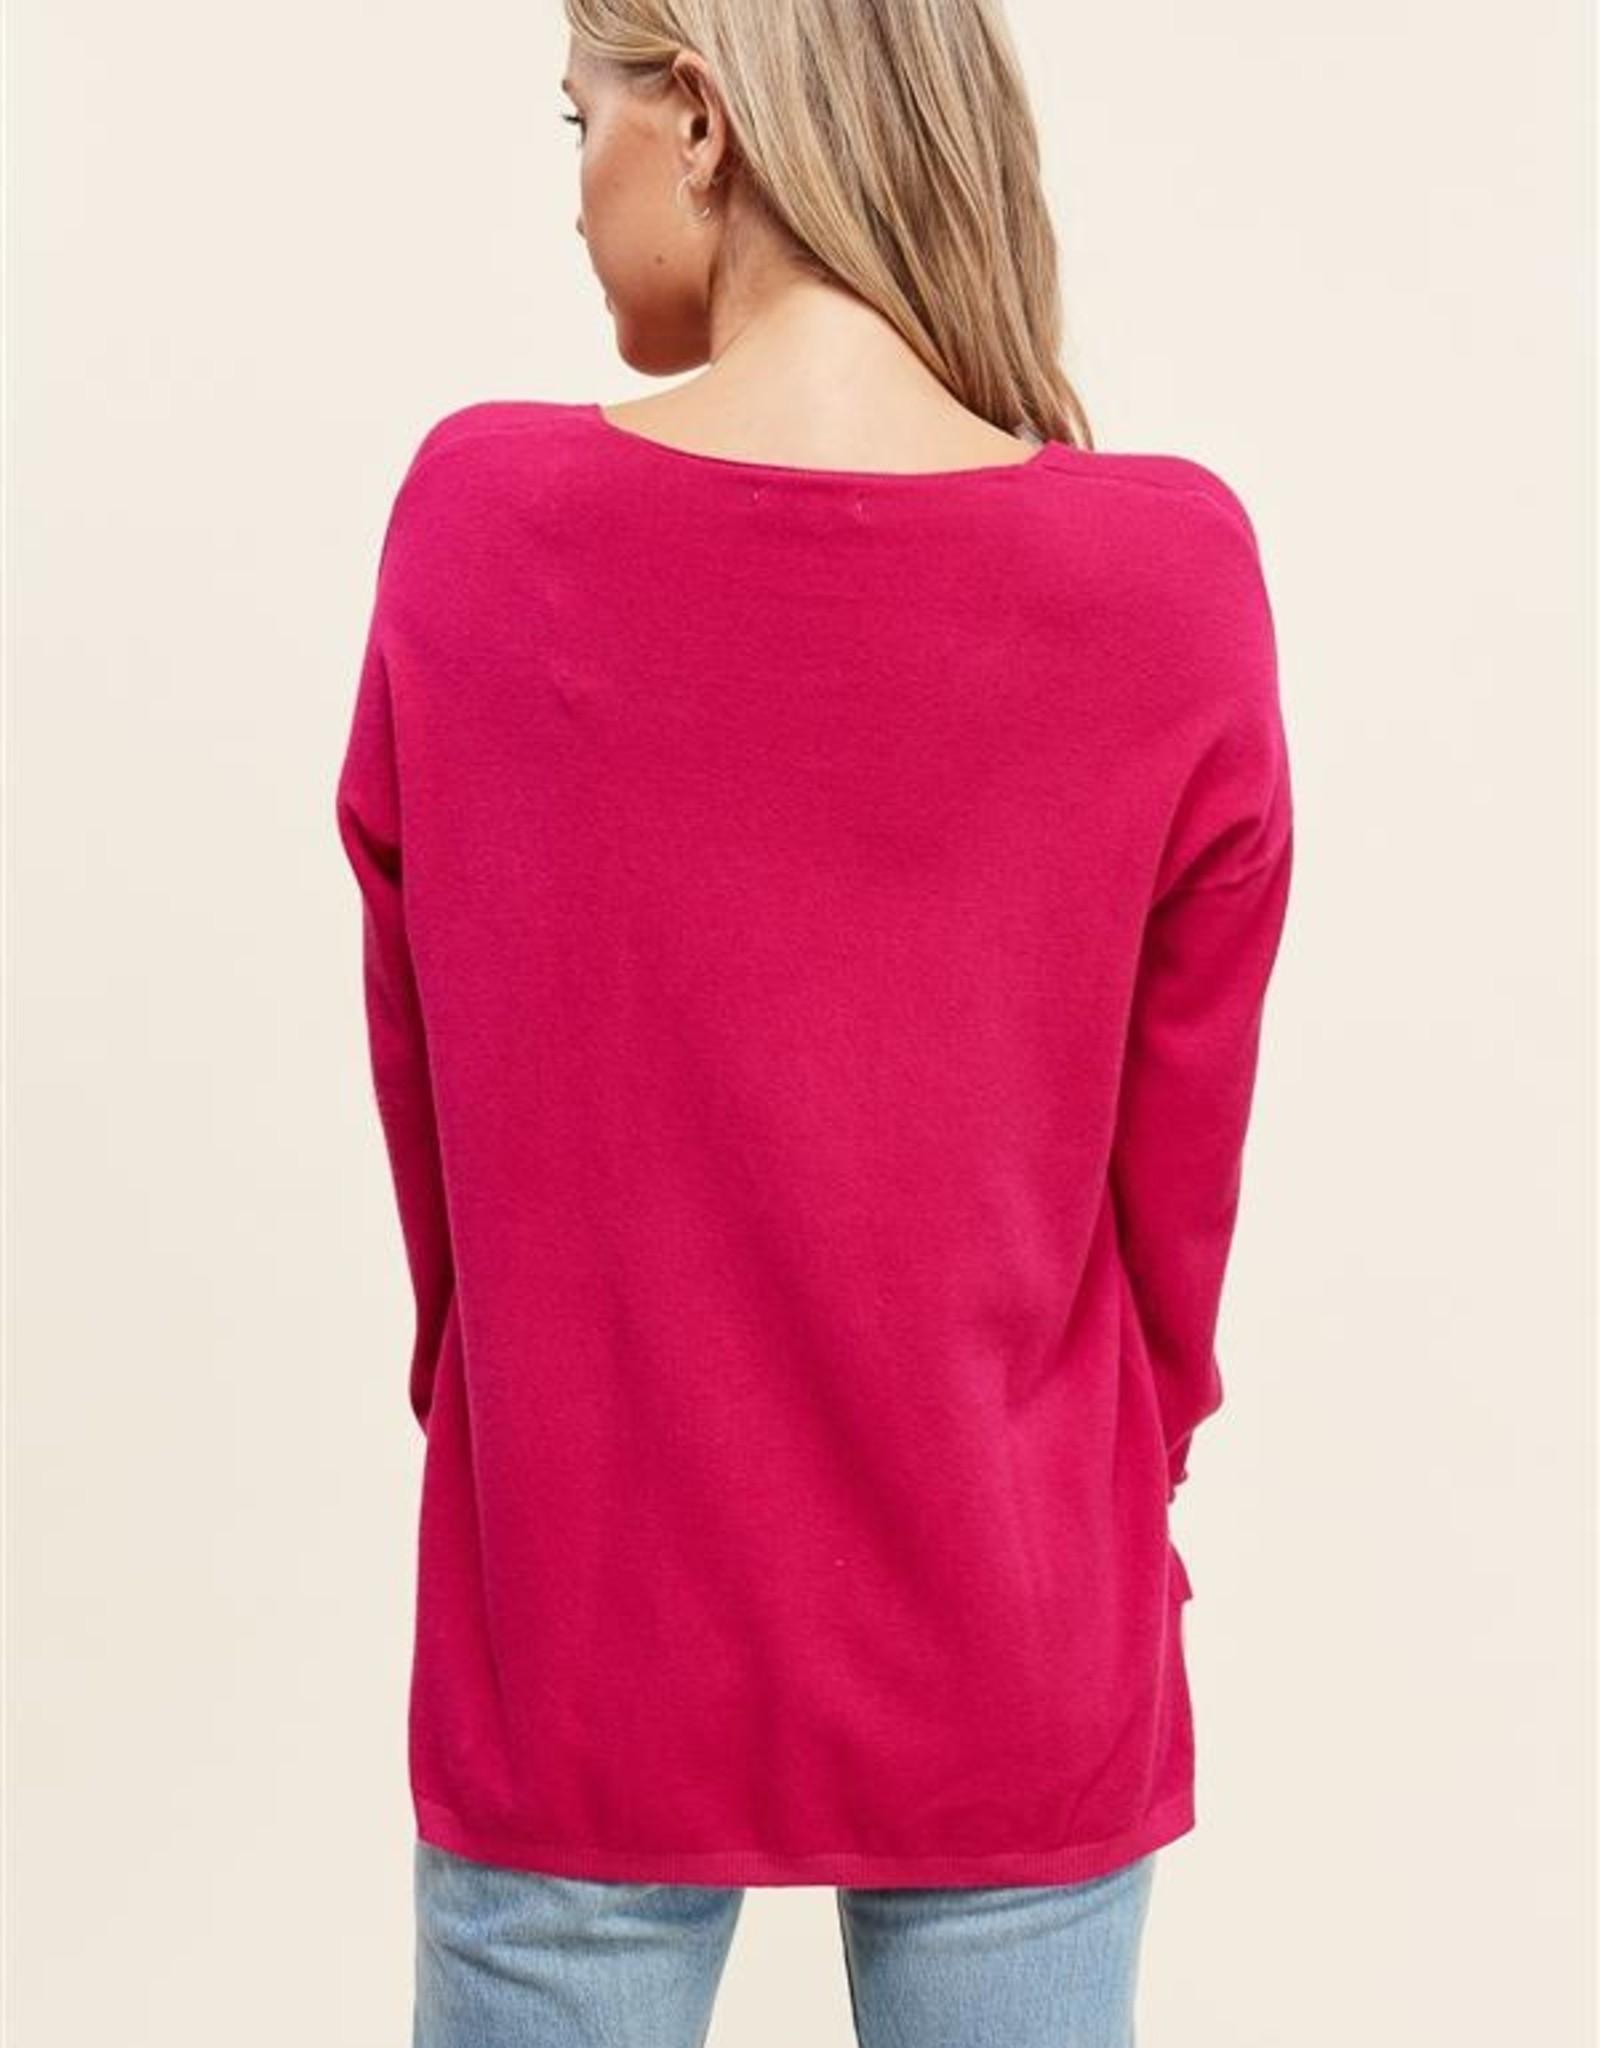 Veronica V Neck Sweater